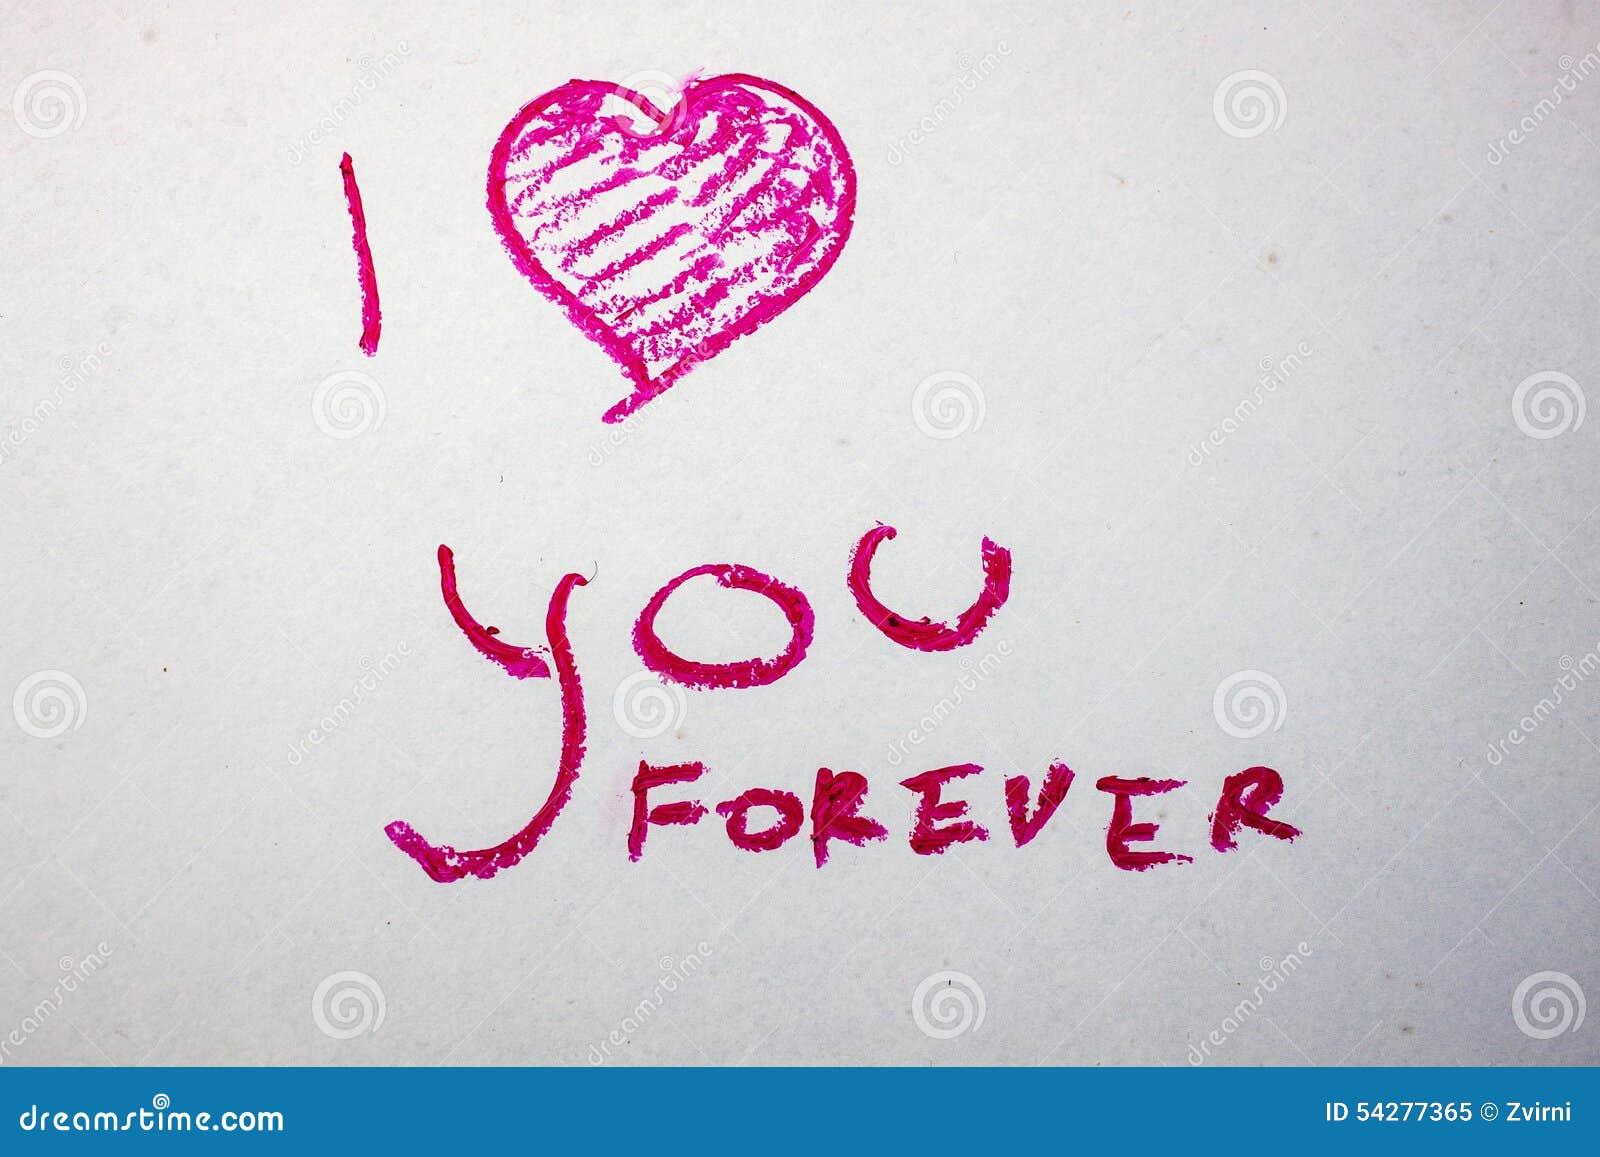 Inscription I love you forever lipstick